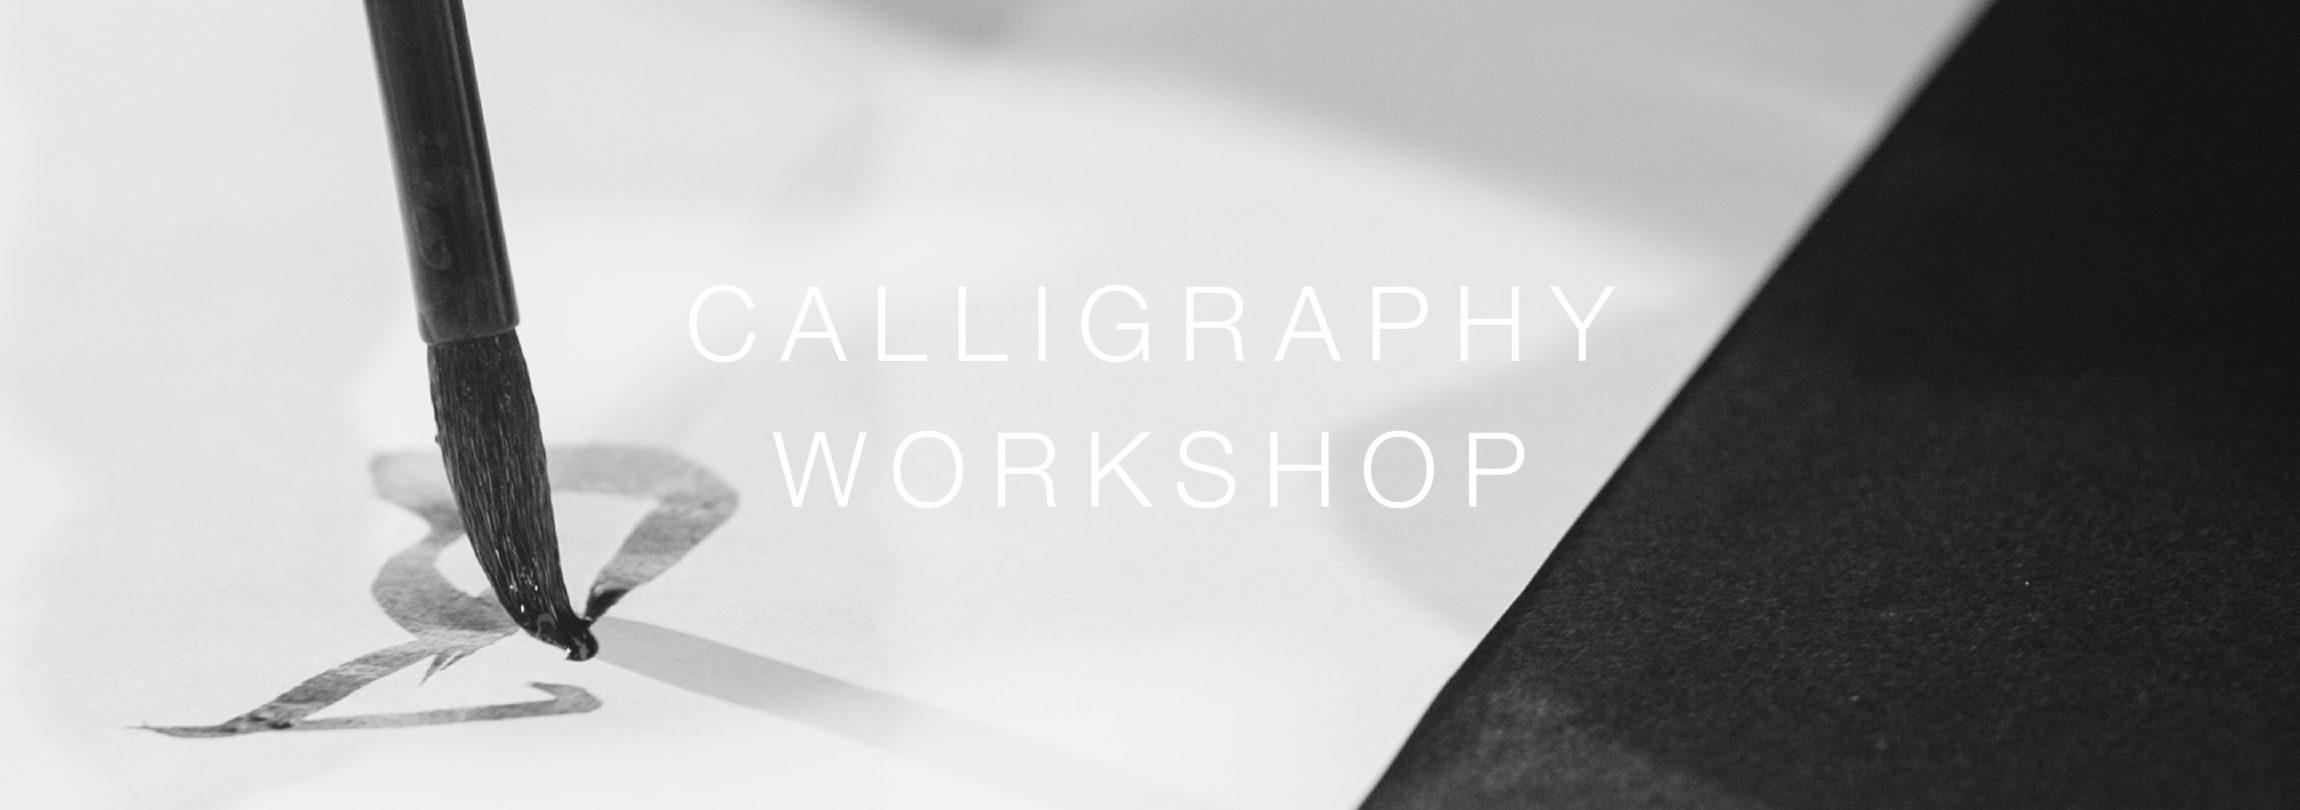 Calligraphy Workshop Tokyobike London